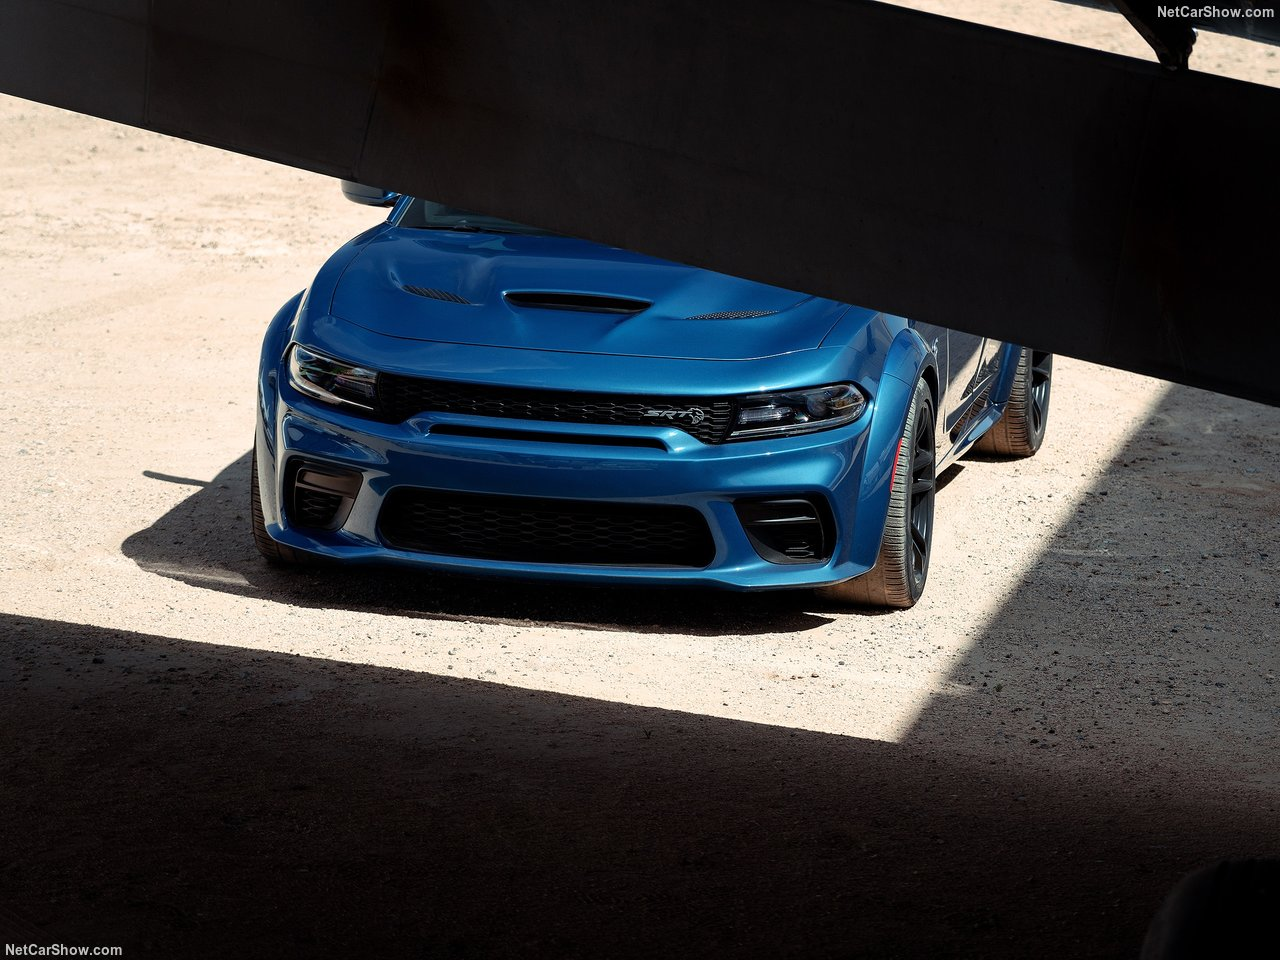 Paklena maca - Dodge Charger Hellcat Widebody